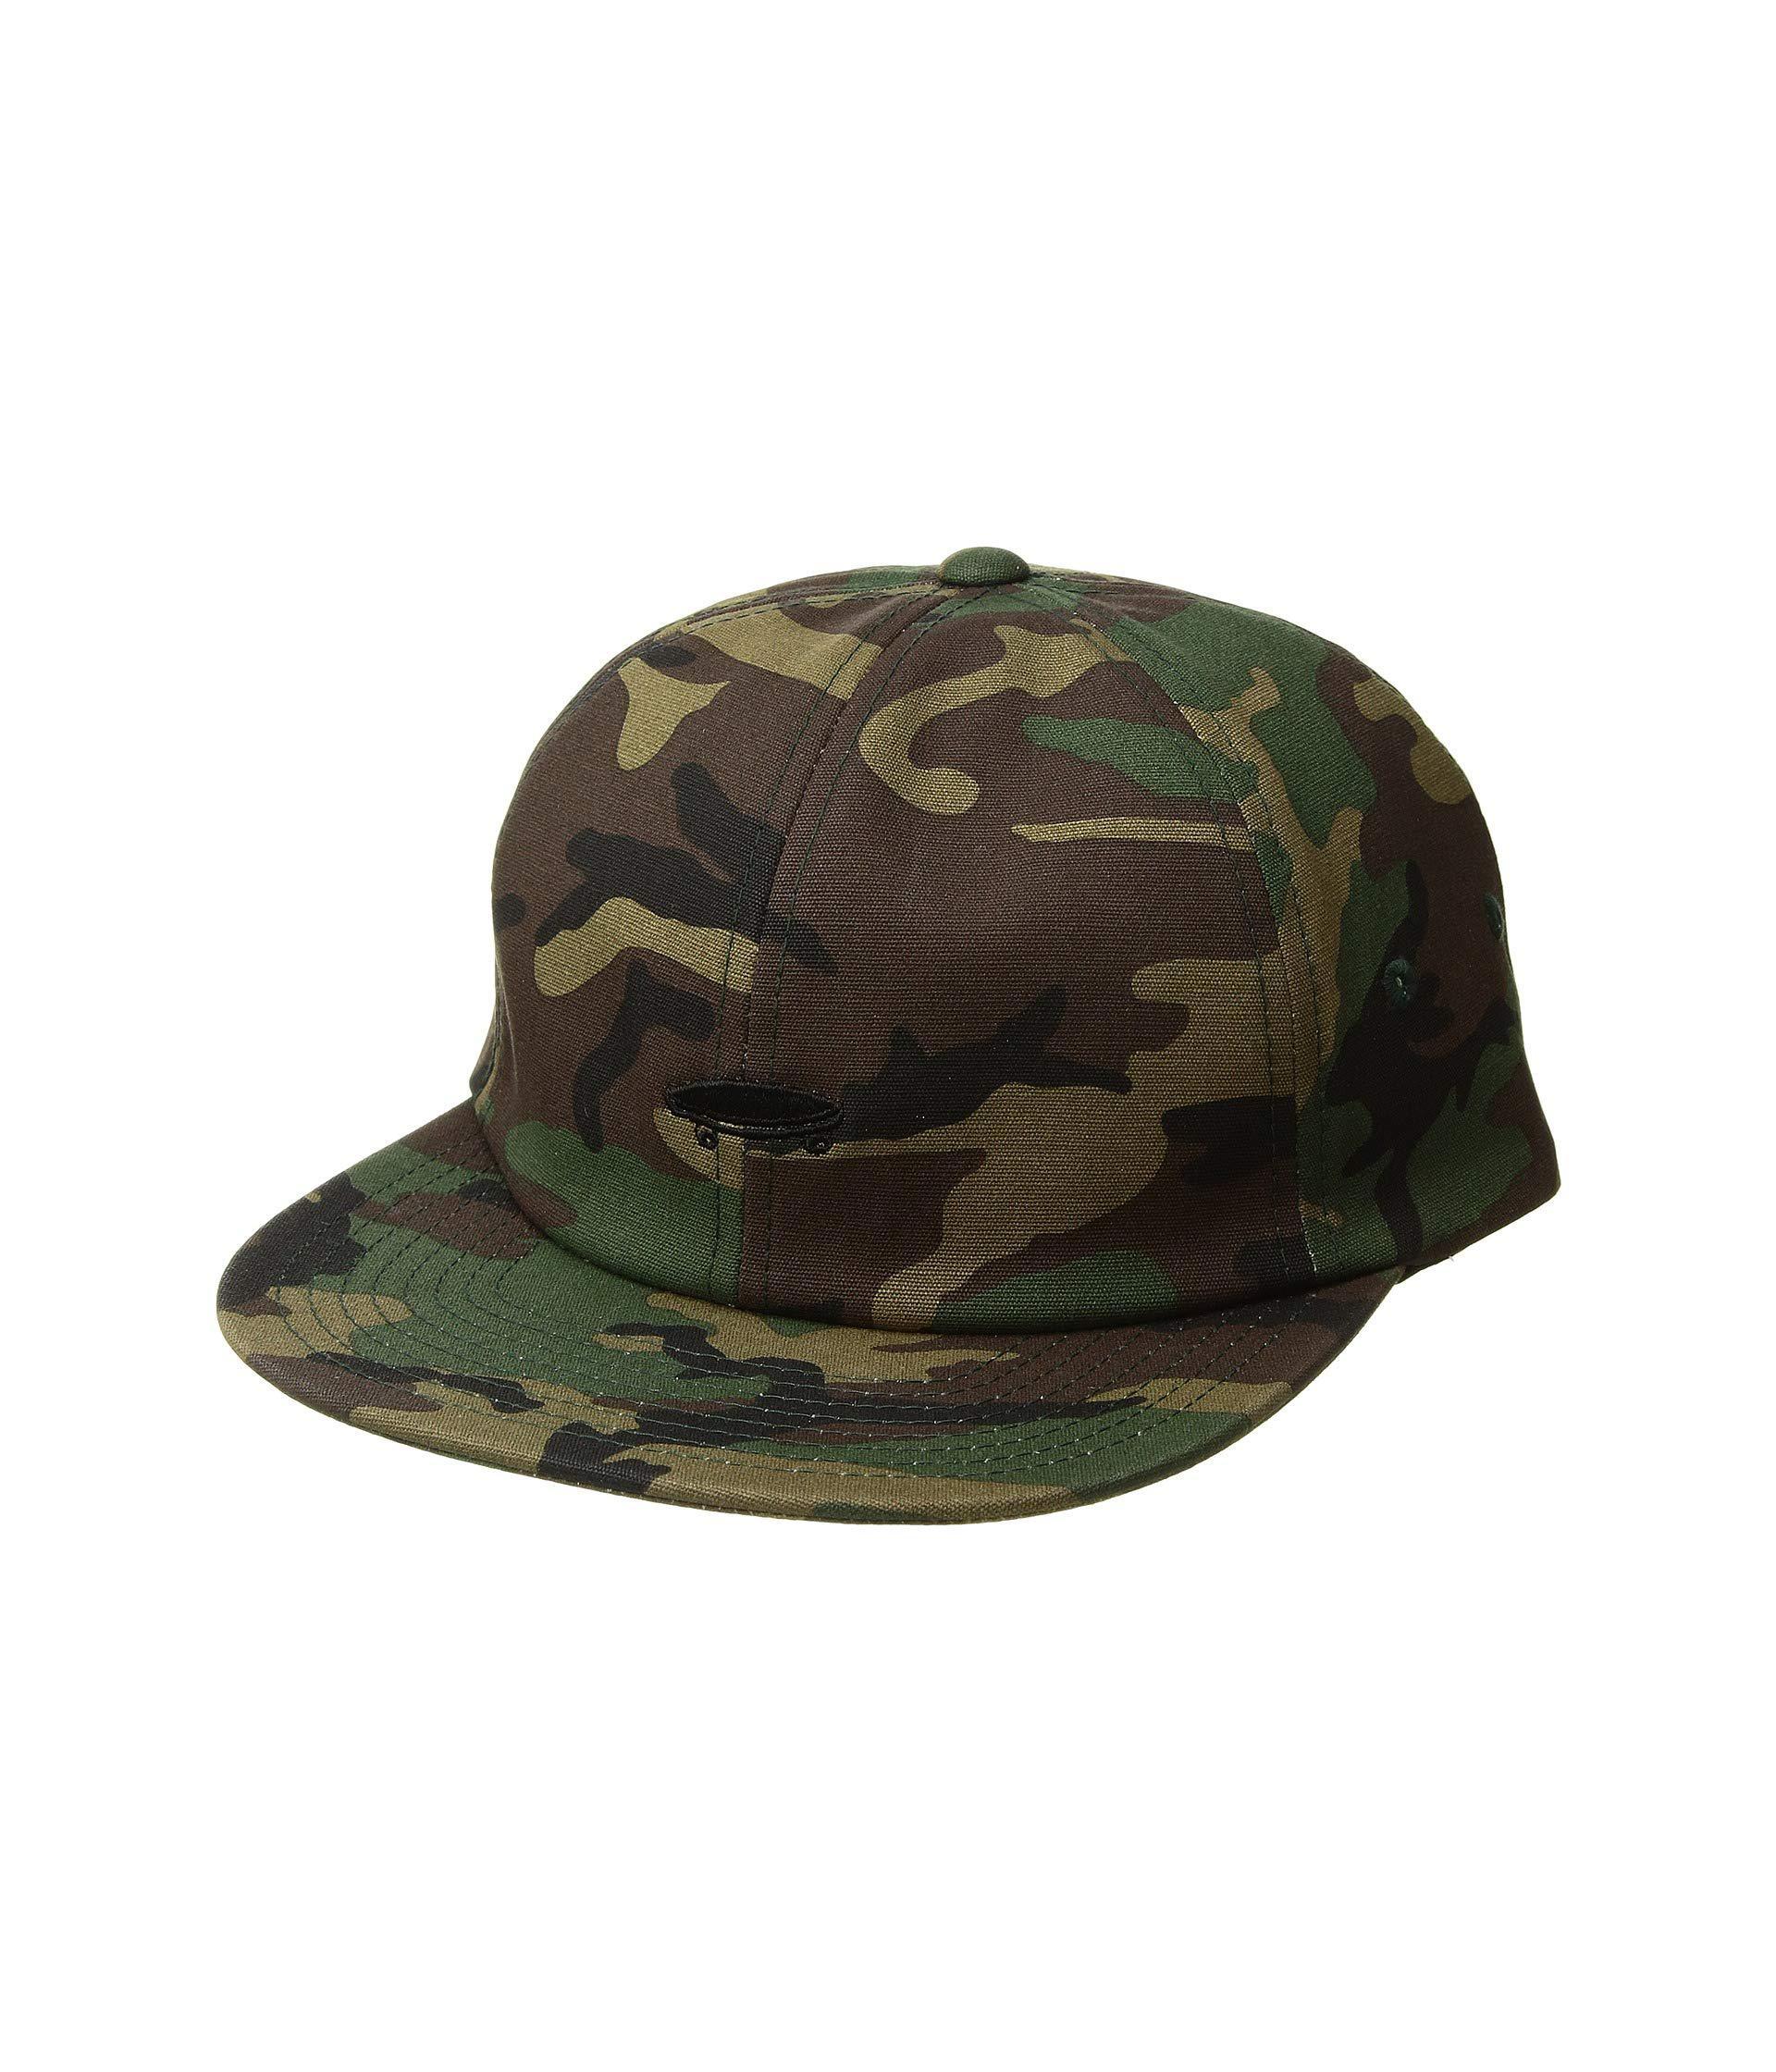 Lyst - Vans Salton Ii Jockey Hat (dress Blues) Baseball Caps in ... c2c75003bb7e